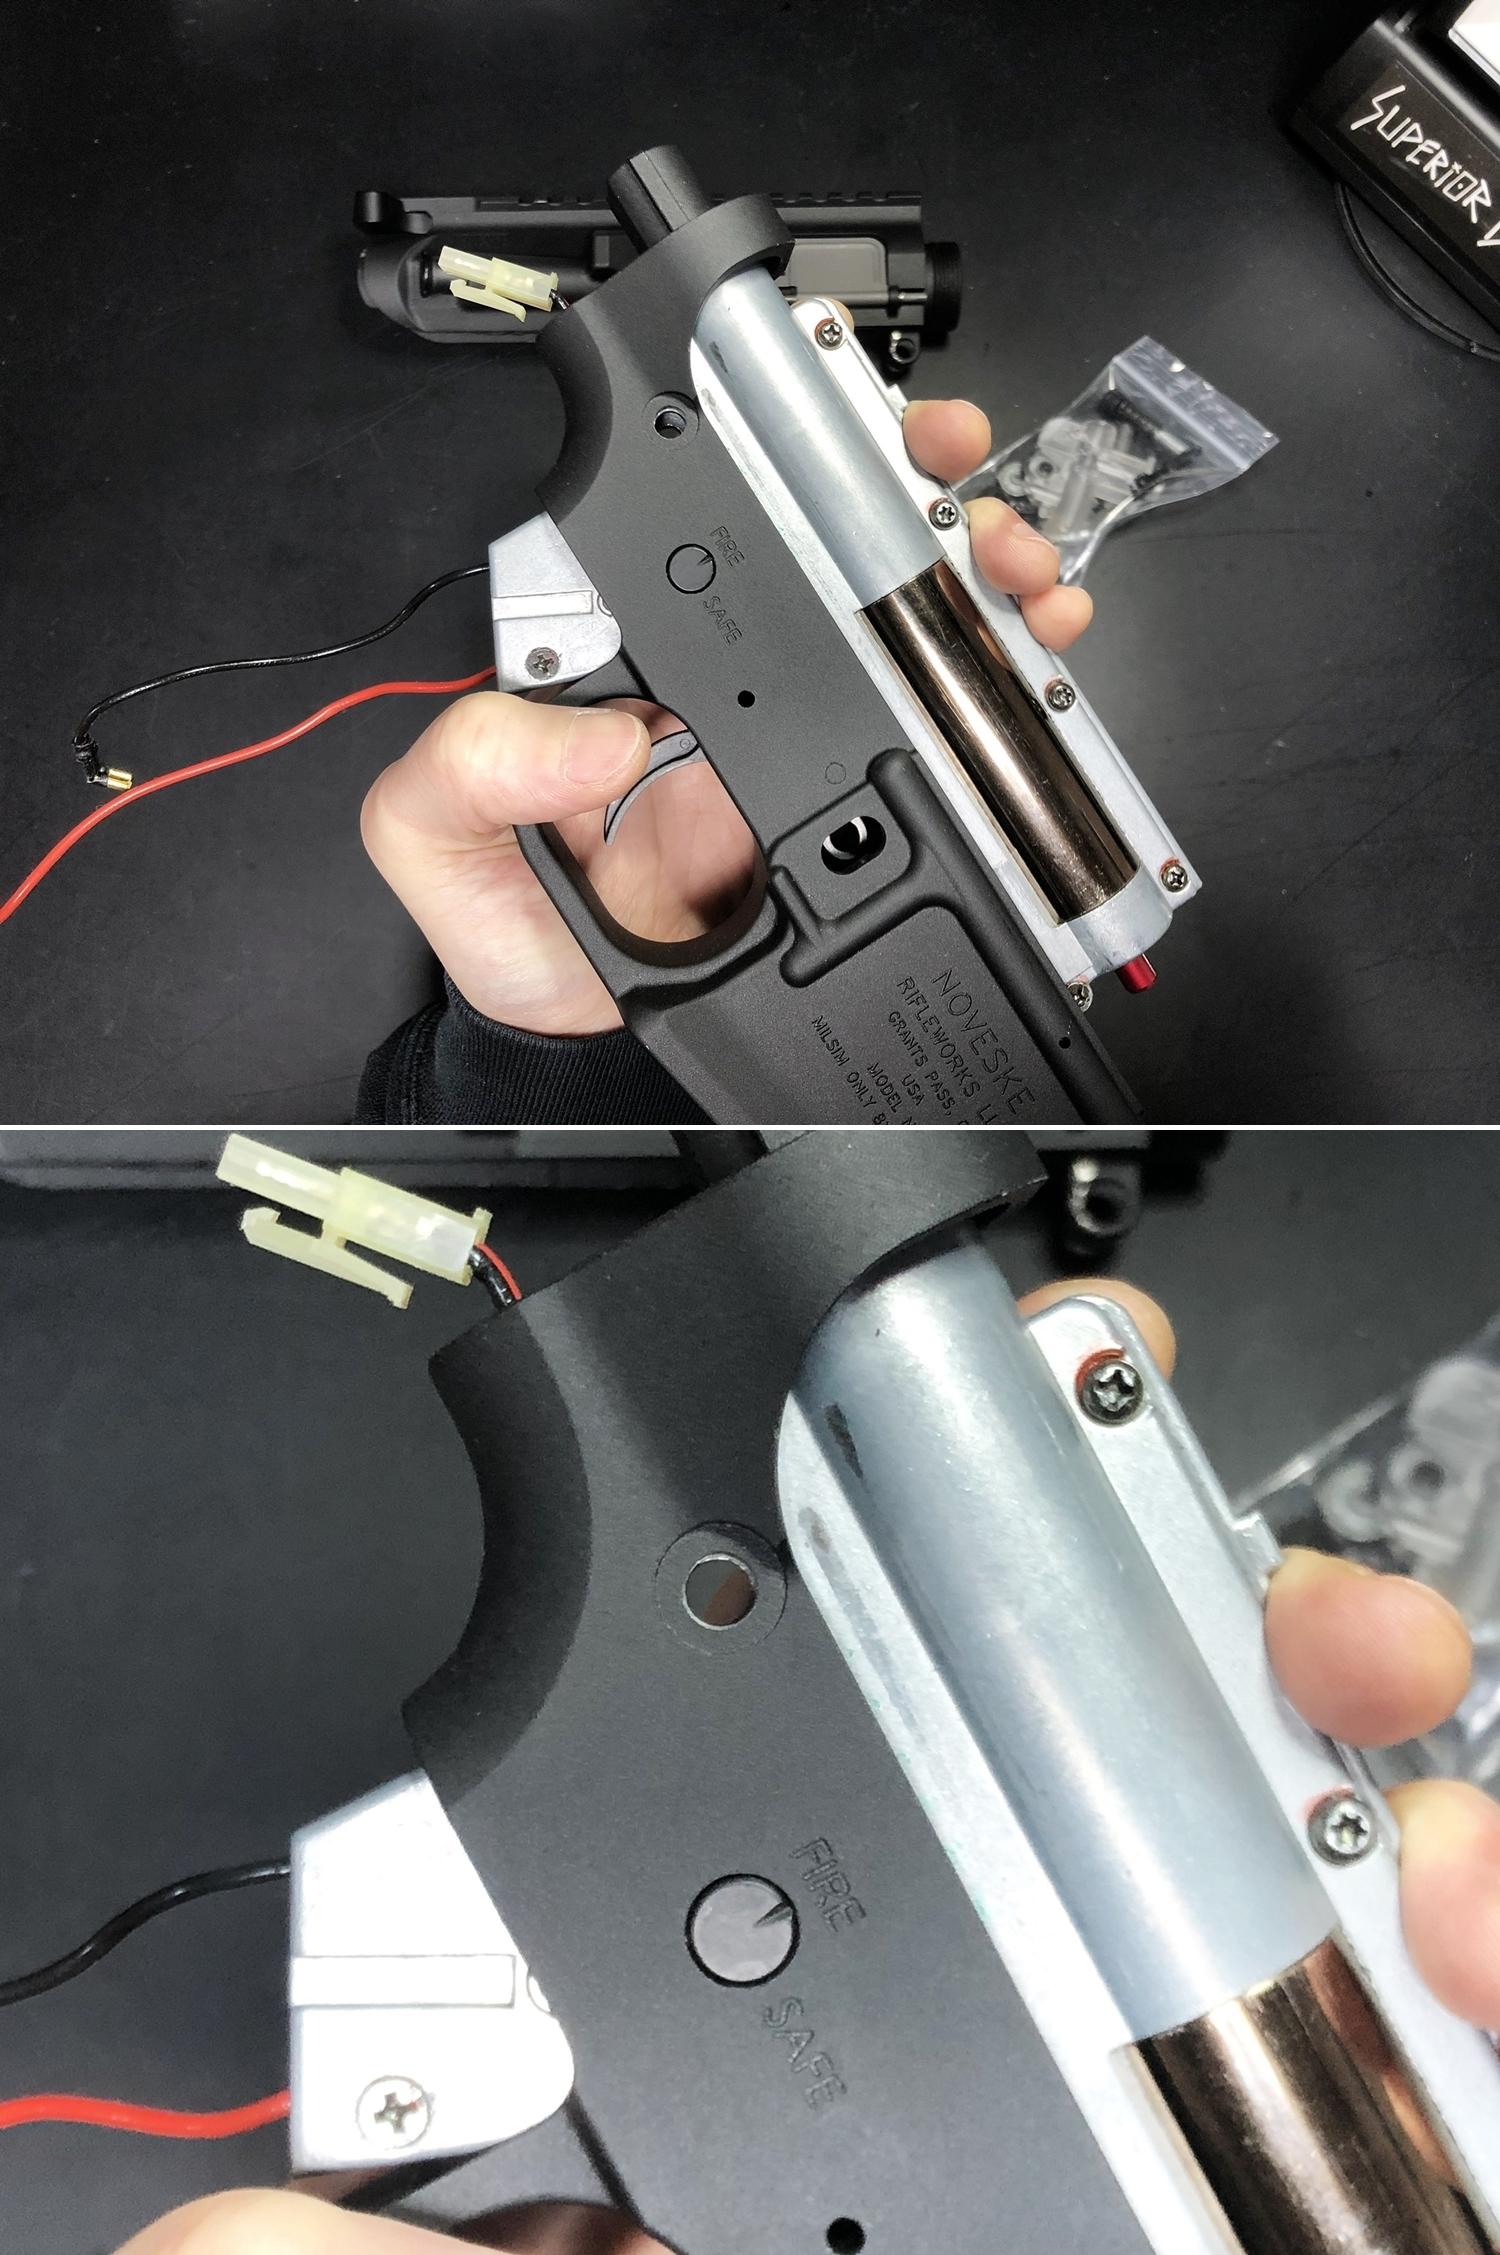 9 NOVESKE GEN3 N4 BY MADBULL!! 『第一弾』 新たにSTD民間系ARを作り始めたいと思います!! STD AR-15 M4 スタンダード 電動ガン マルイ ノベスケ ノベスキー マットブル メタルフレーム 動作テスト 組込 取付 カス